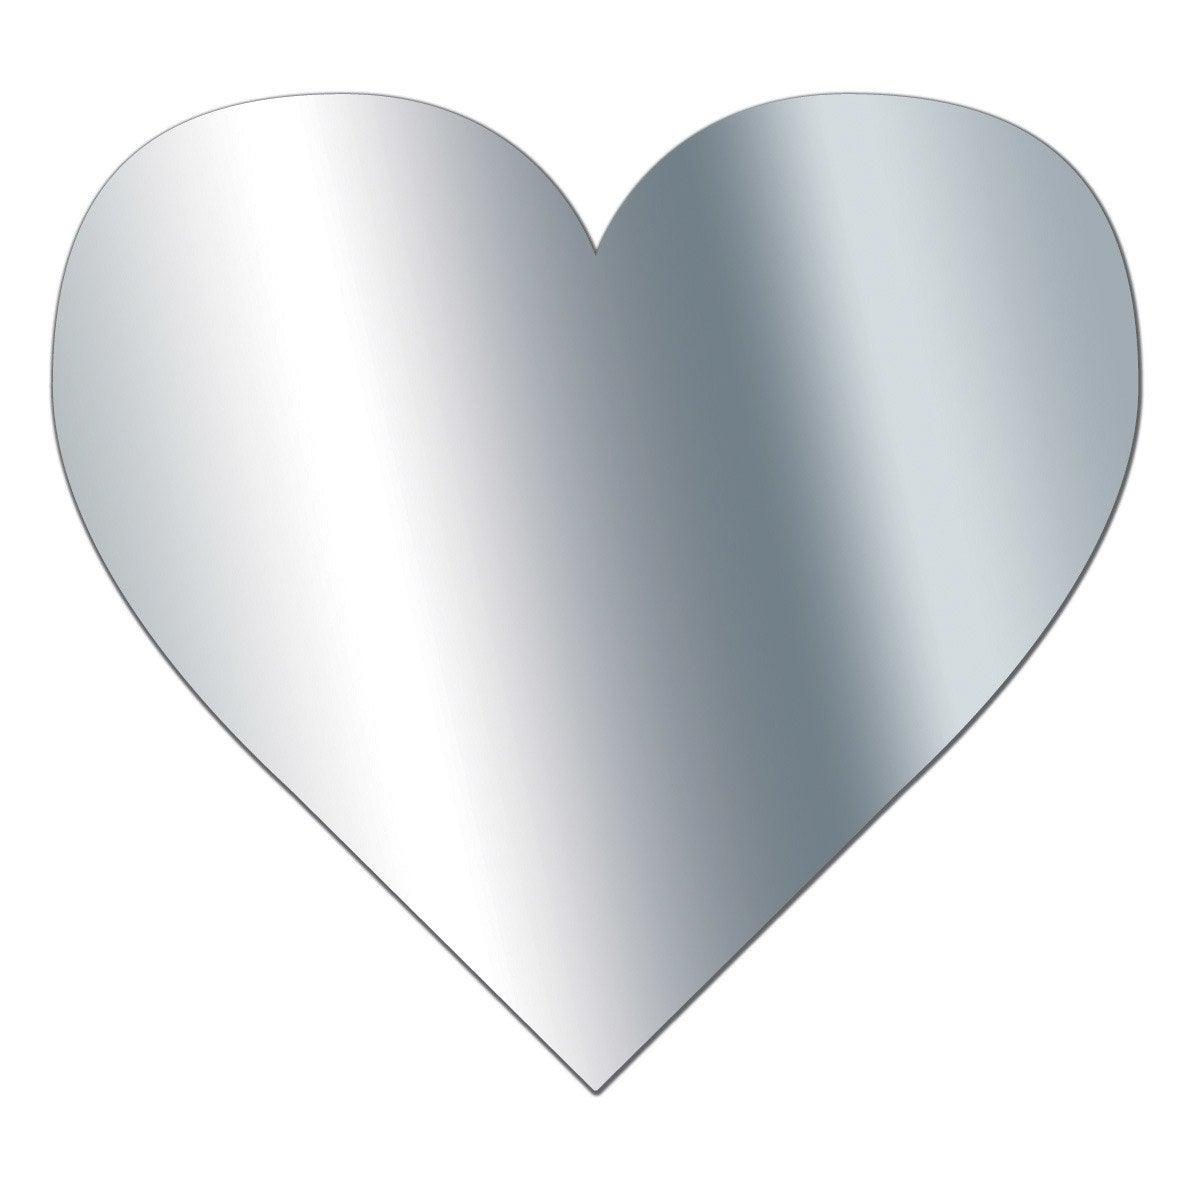 Miroir adh sif coeur 10 x 10 cm leroy merlin - Miroir adhesif leroy merlin ...